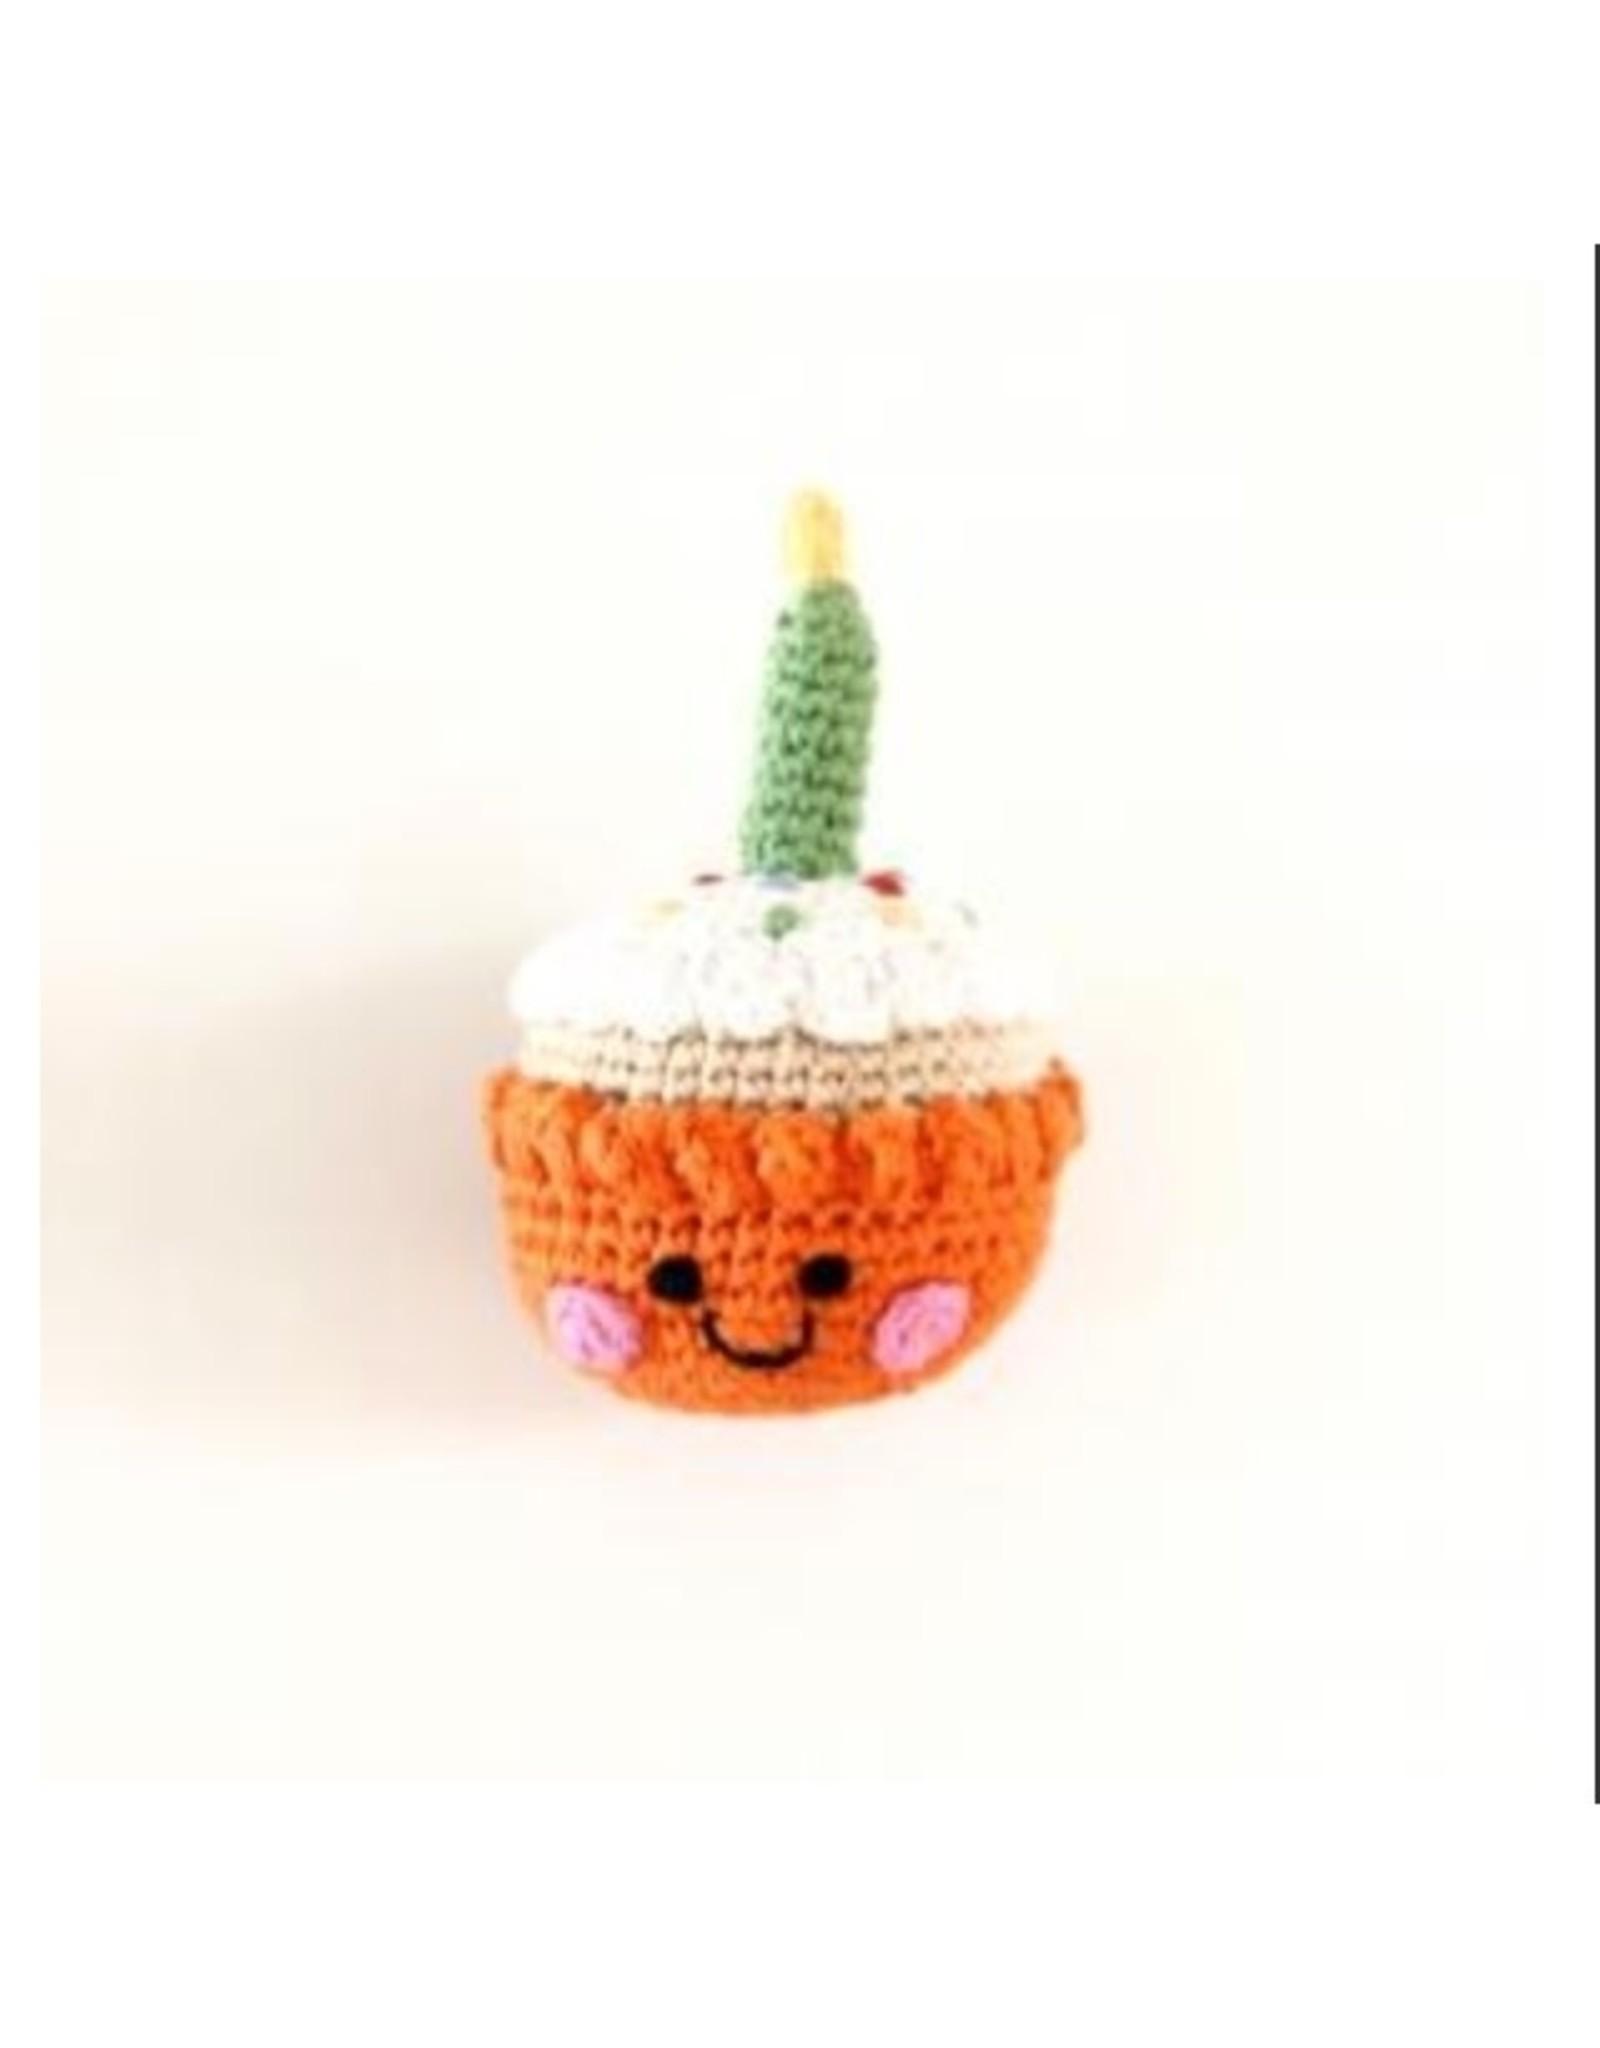 Pebble Orange Cupcake Rattle w/ Candle. Bangladesh